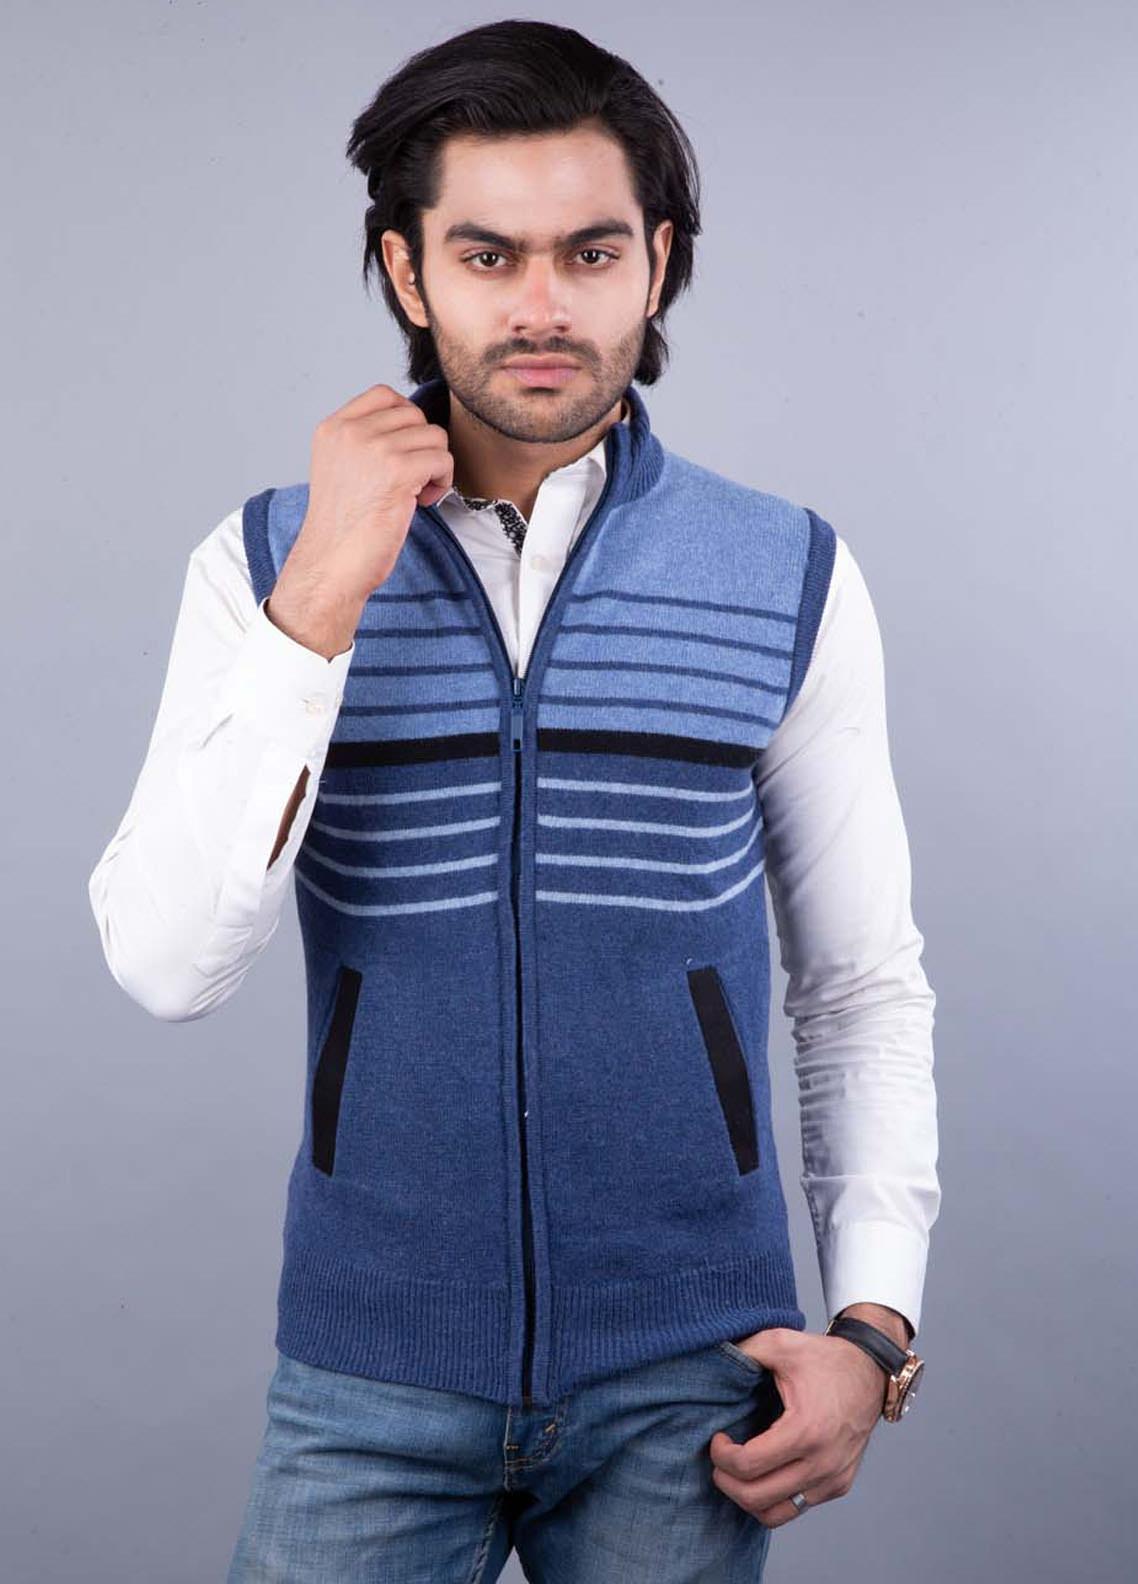 Oxford Lambswool Sleeveless Zipper Men Sweaters -  521 S-L ZIP BLUE